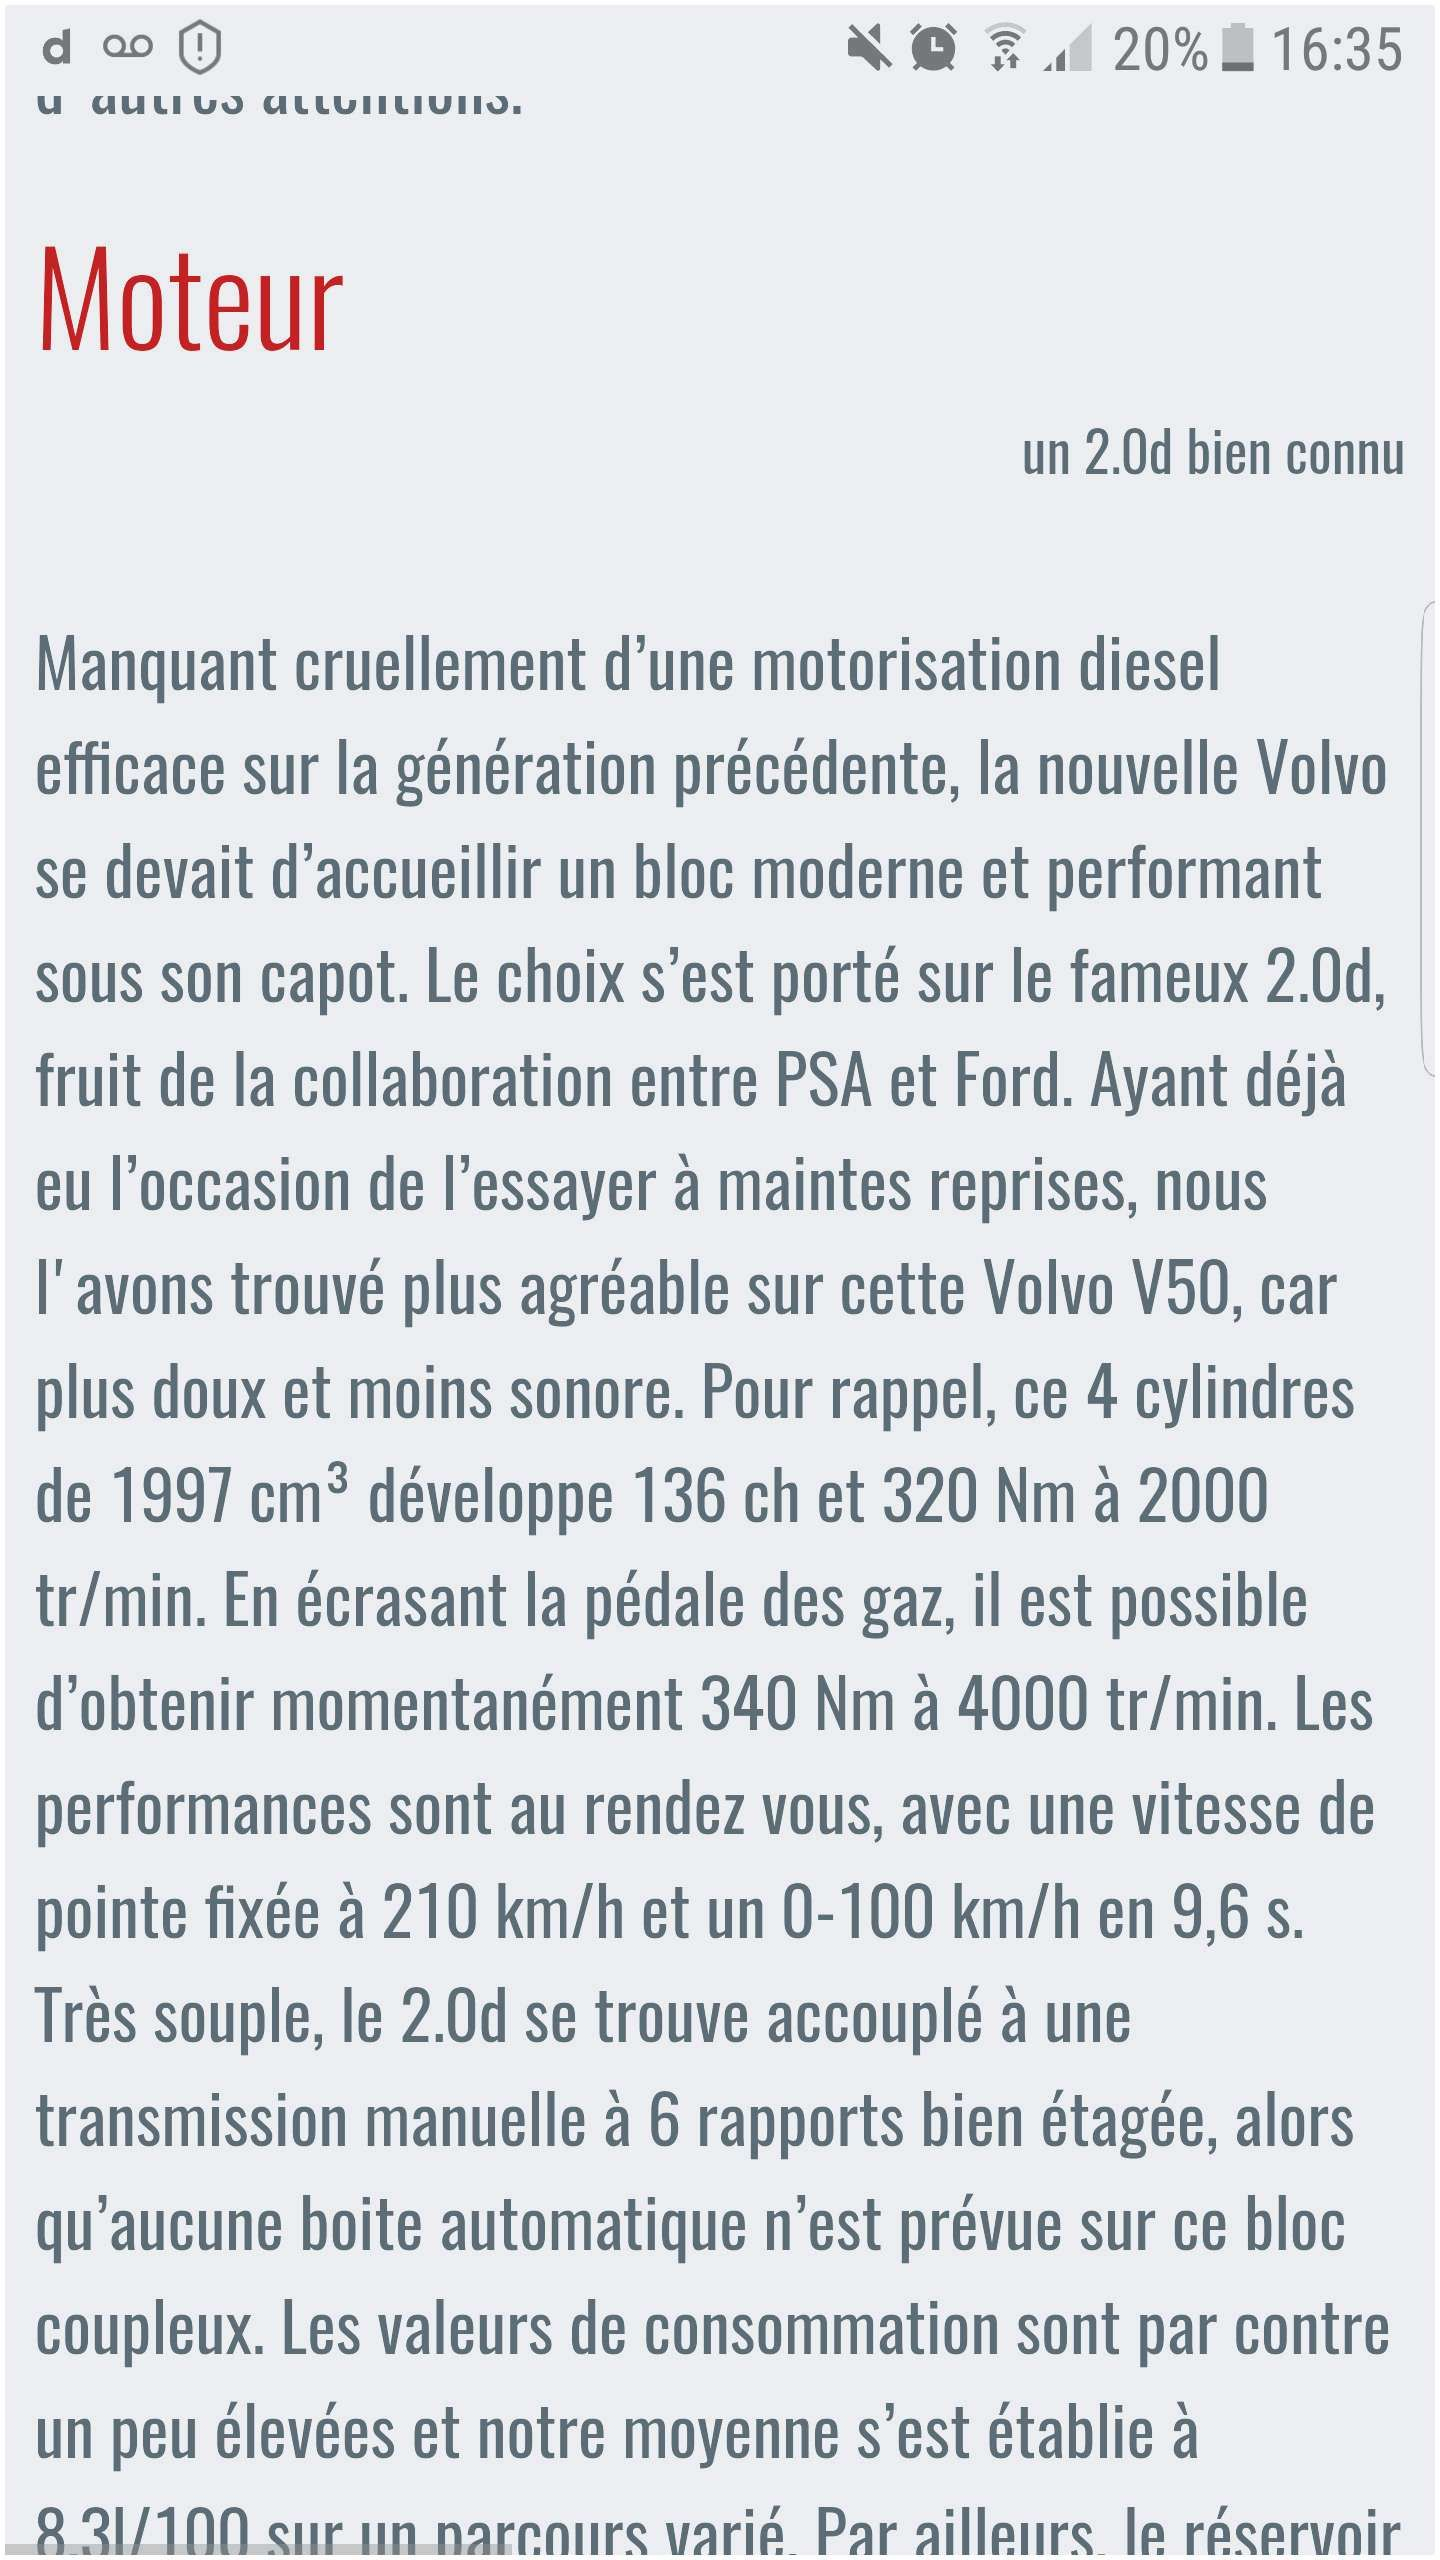 Carrefour Mobilier Unique Pin by Ketty Corp On Idées De Meubles In 2019